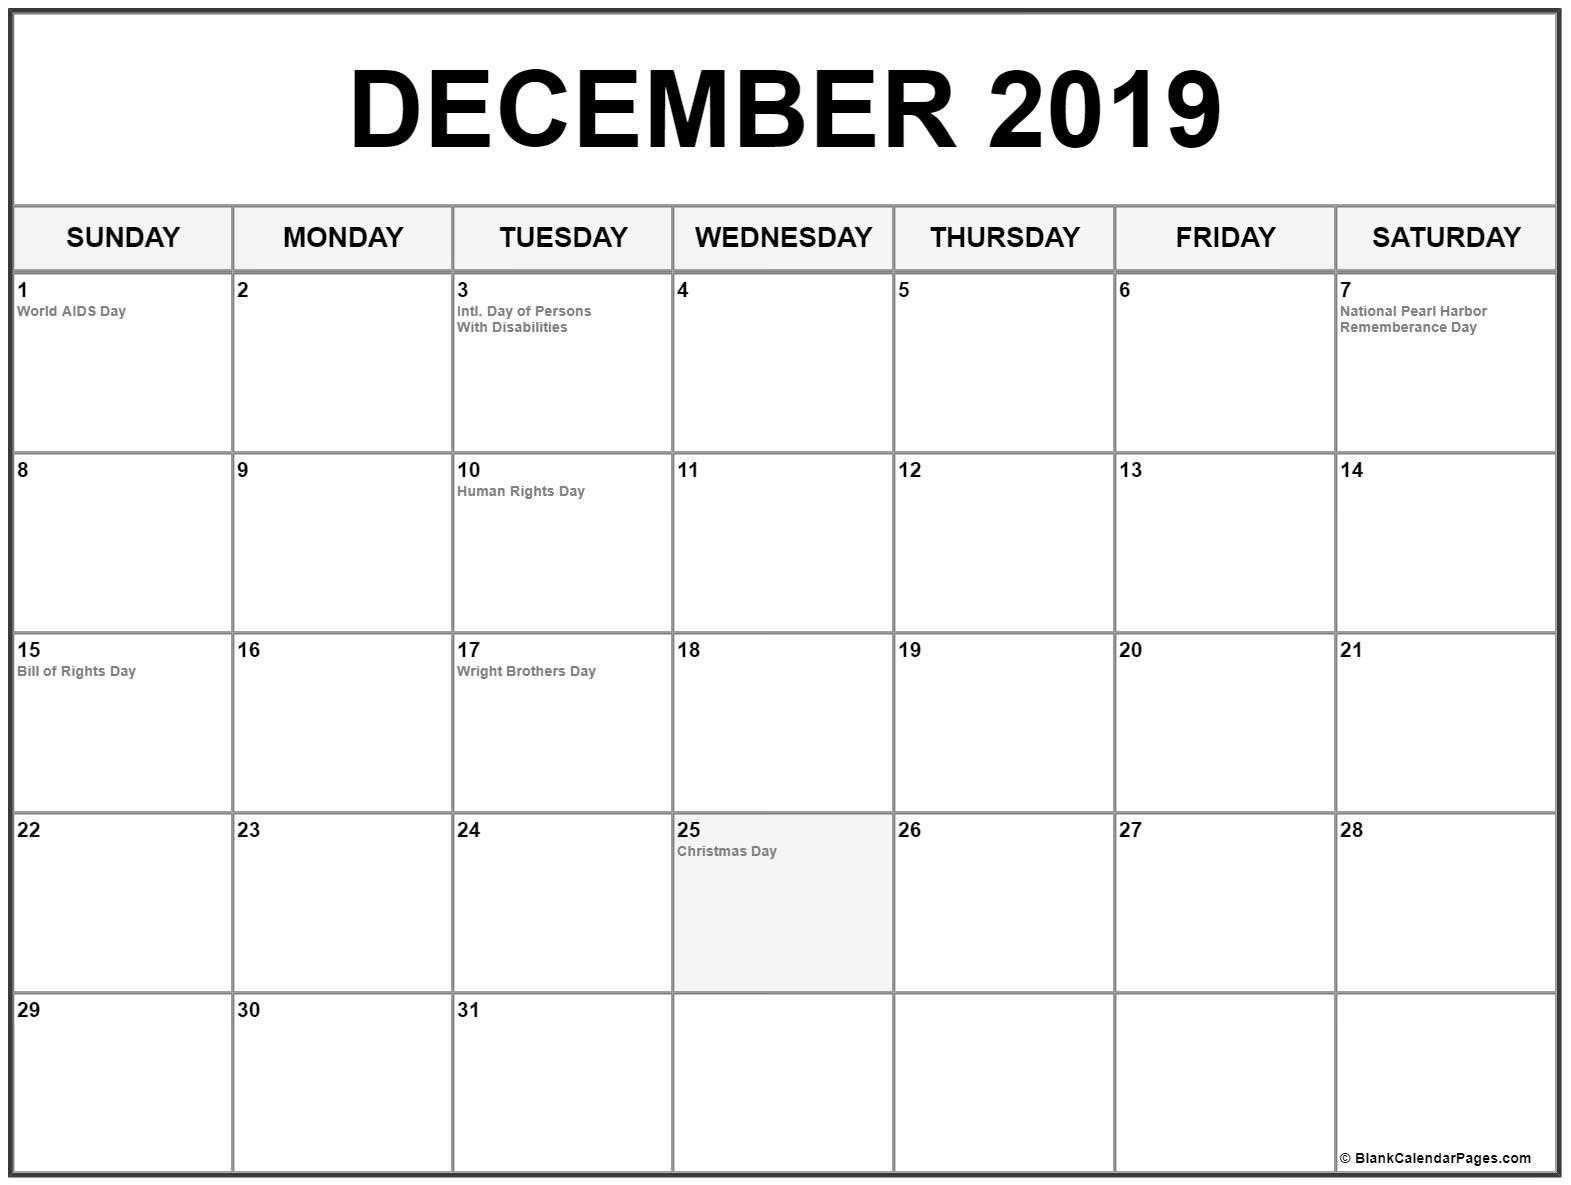 December Calendar 2019 #december #december2019 #december2019Calendar Calendar 2019 December